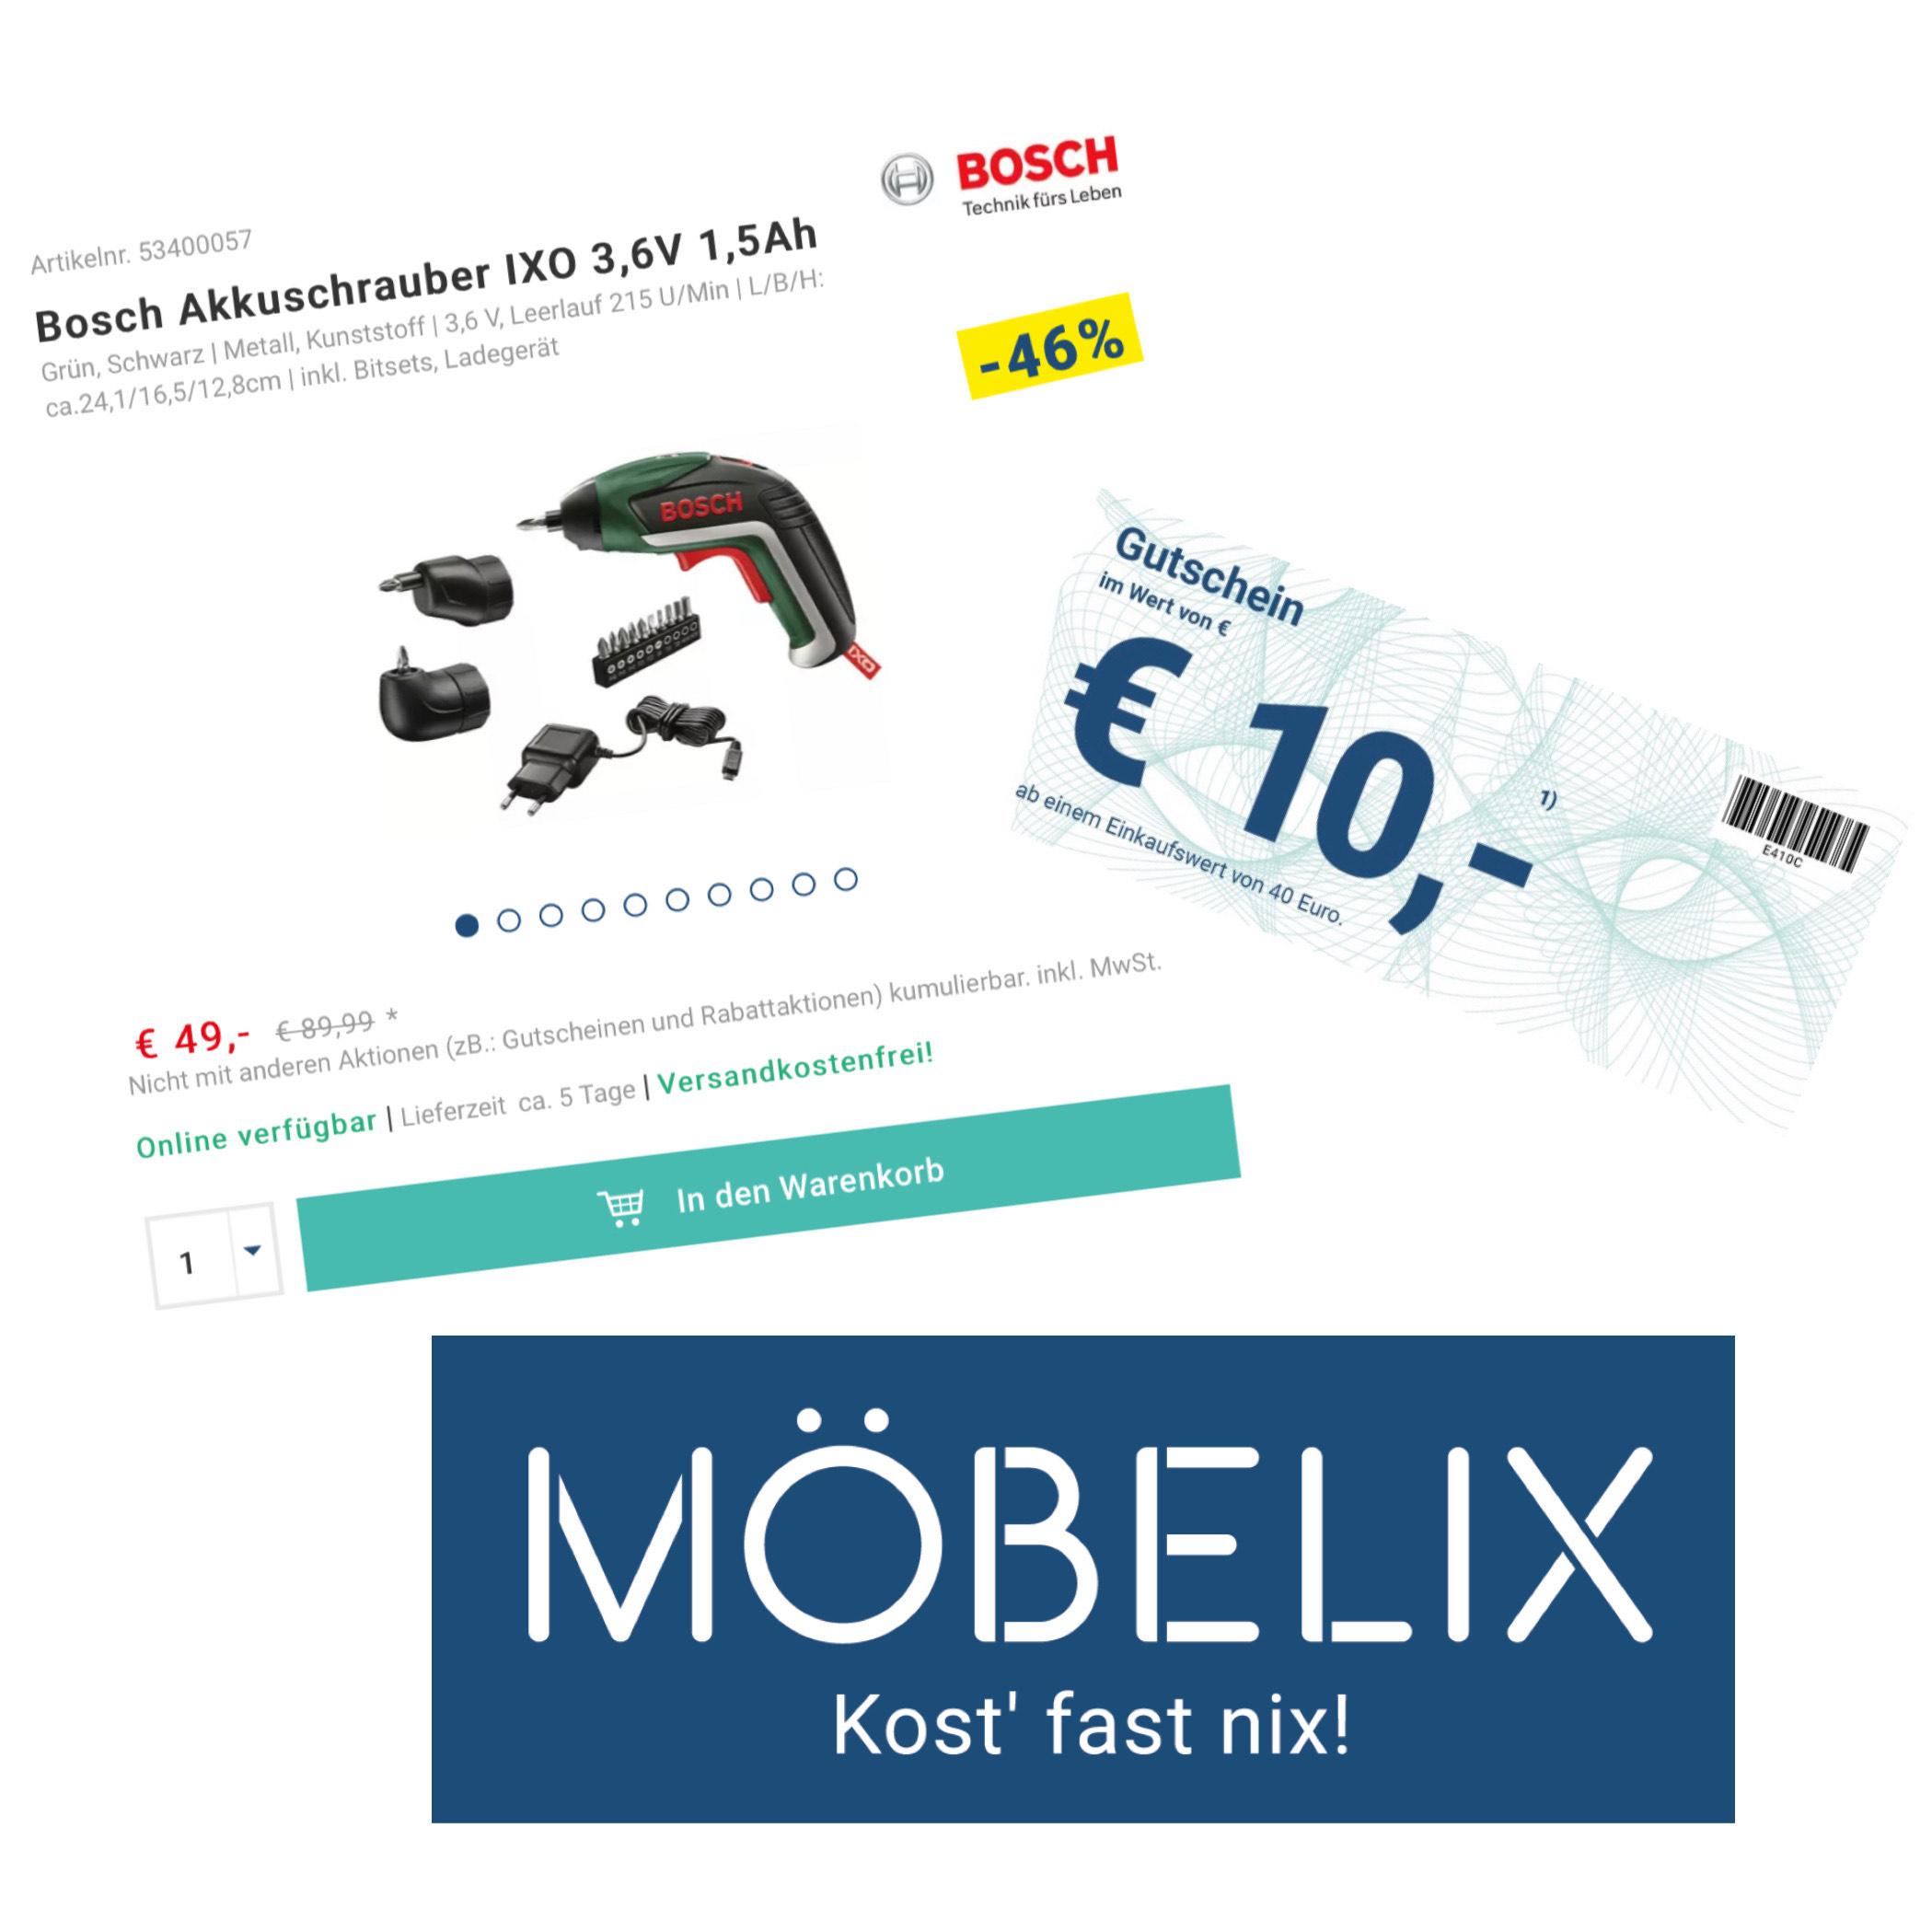 [ Möbelix ] Bosch Akkuschrauber •IXO V Set• mit 2 Aufsätzen & 10 Bits